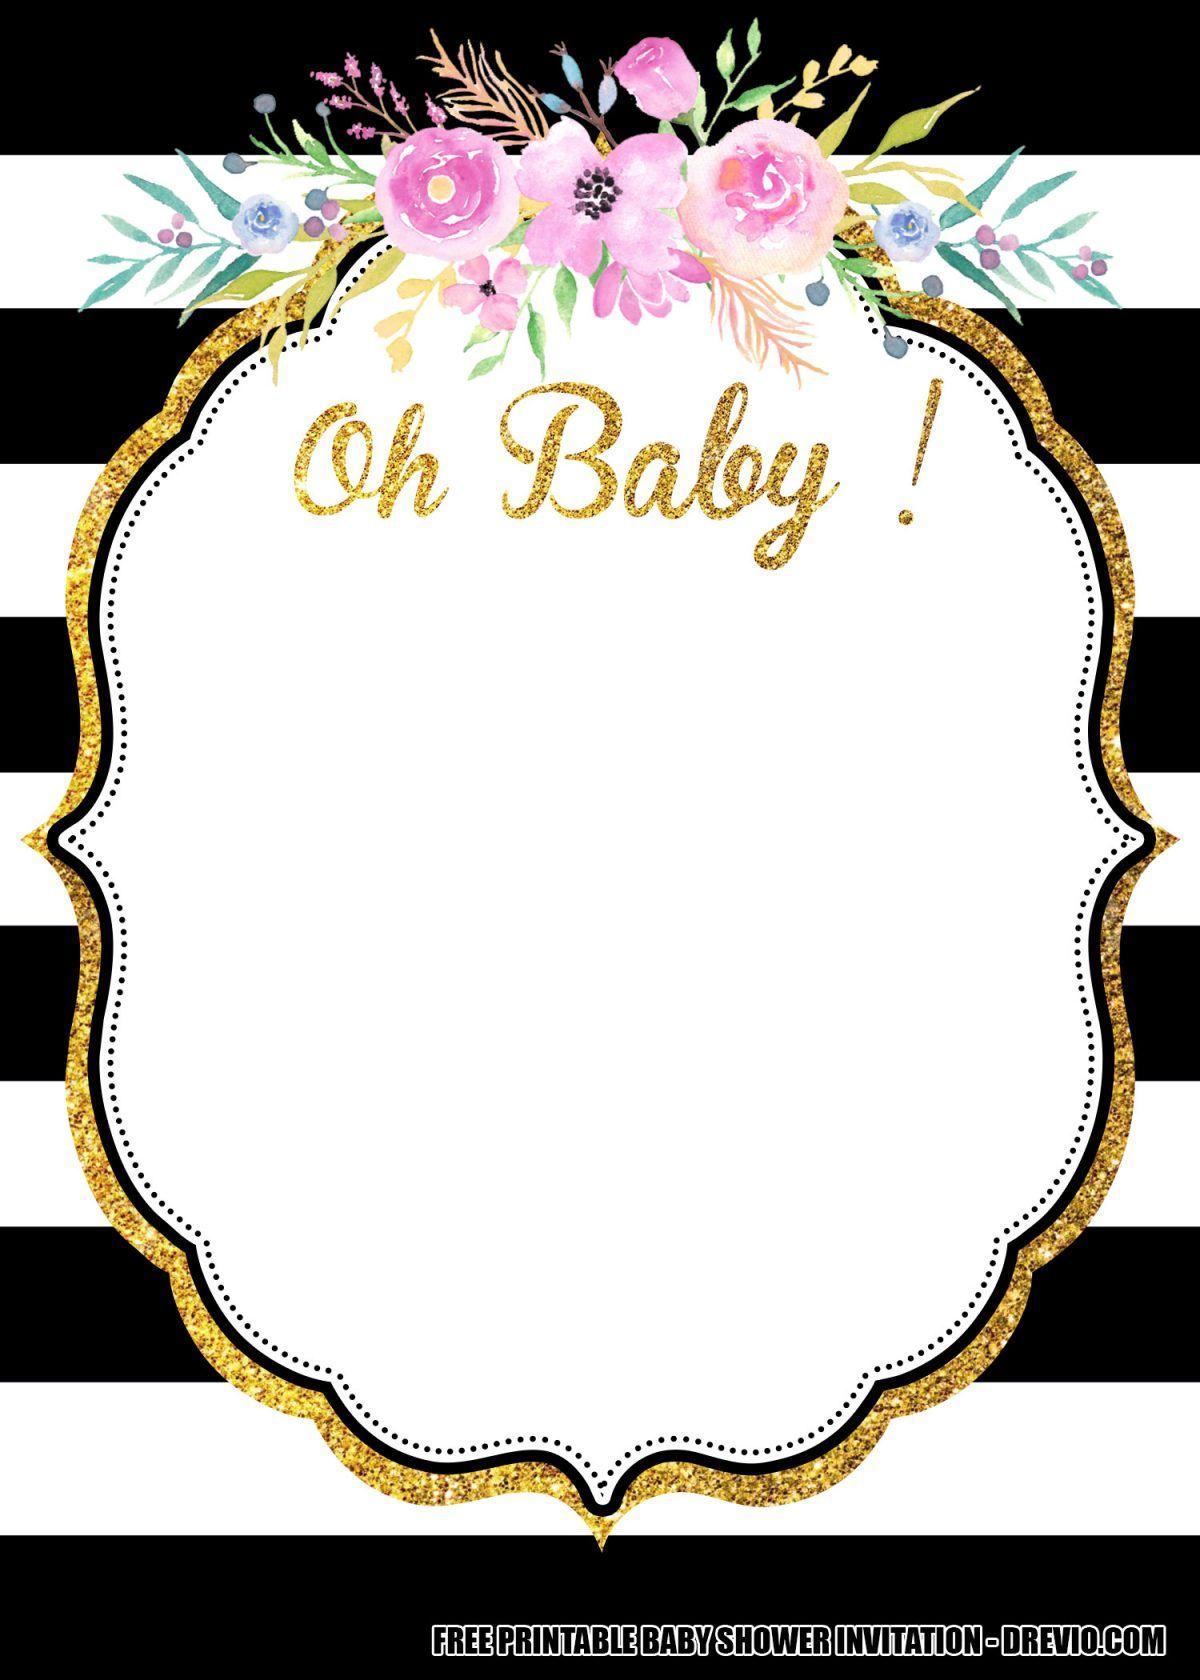 Free Flower Baby Shower Invitation Templates Downloadable Free Printab Printable Baby Shower Invitations Flower Baby Shower Invites Baby Shower Invitations